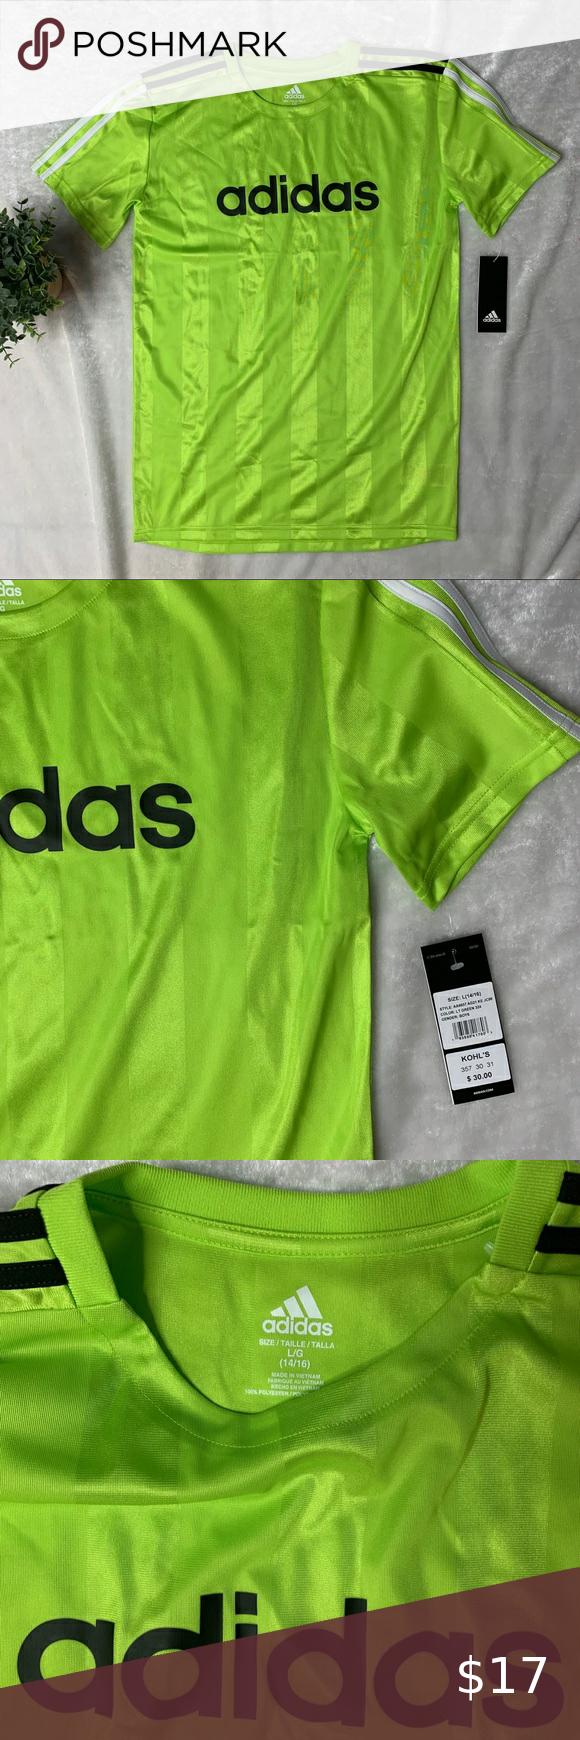 Adidas shirt 👕 in 2020   Adidas shirt